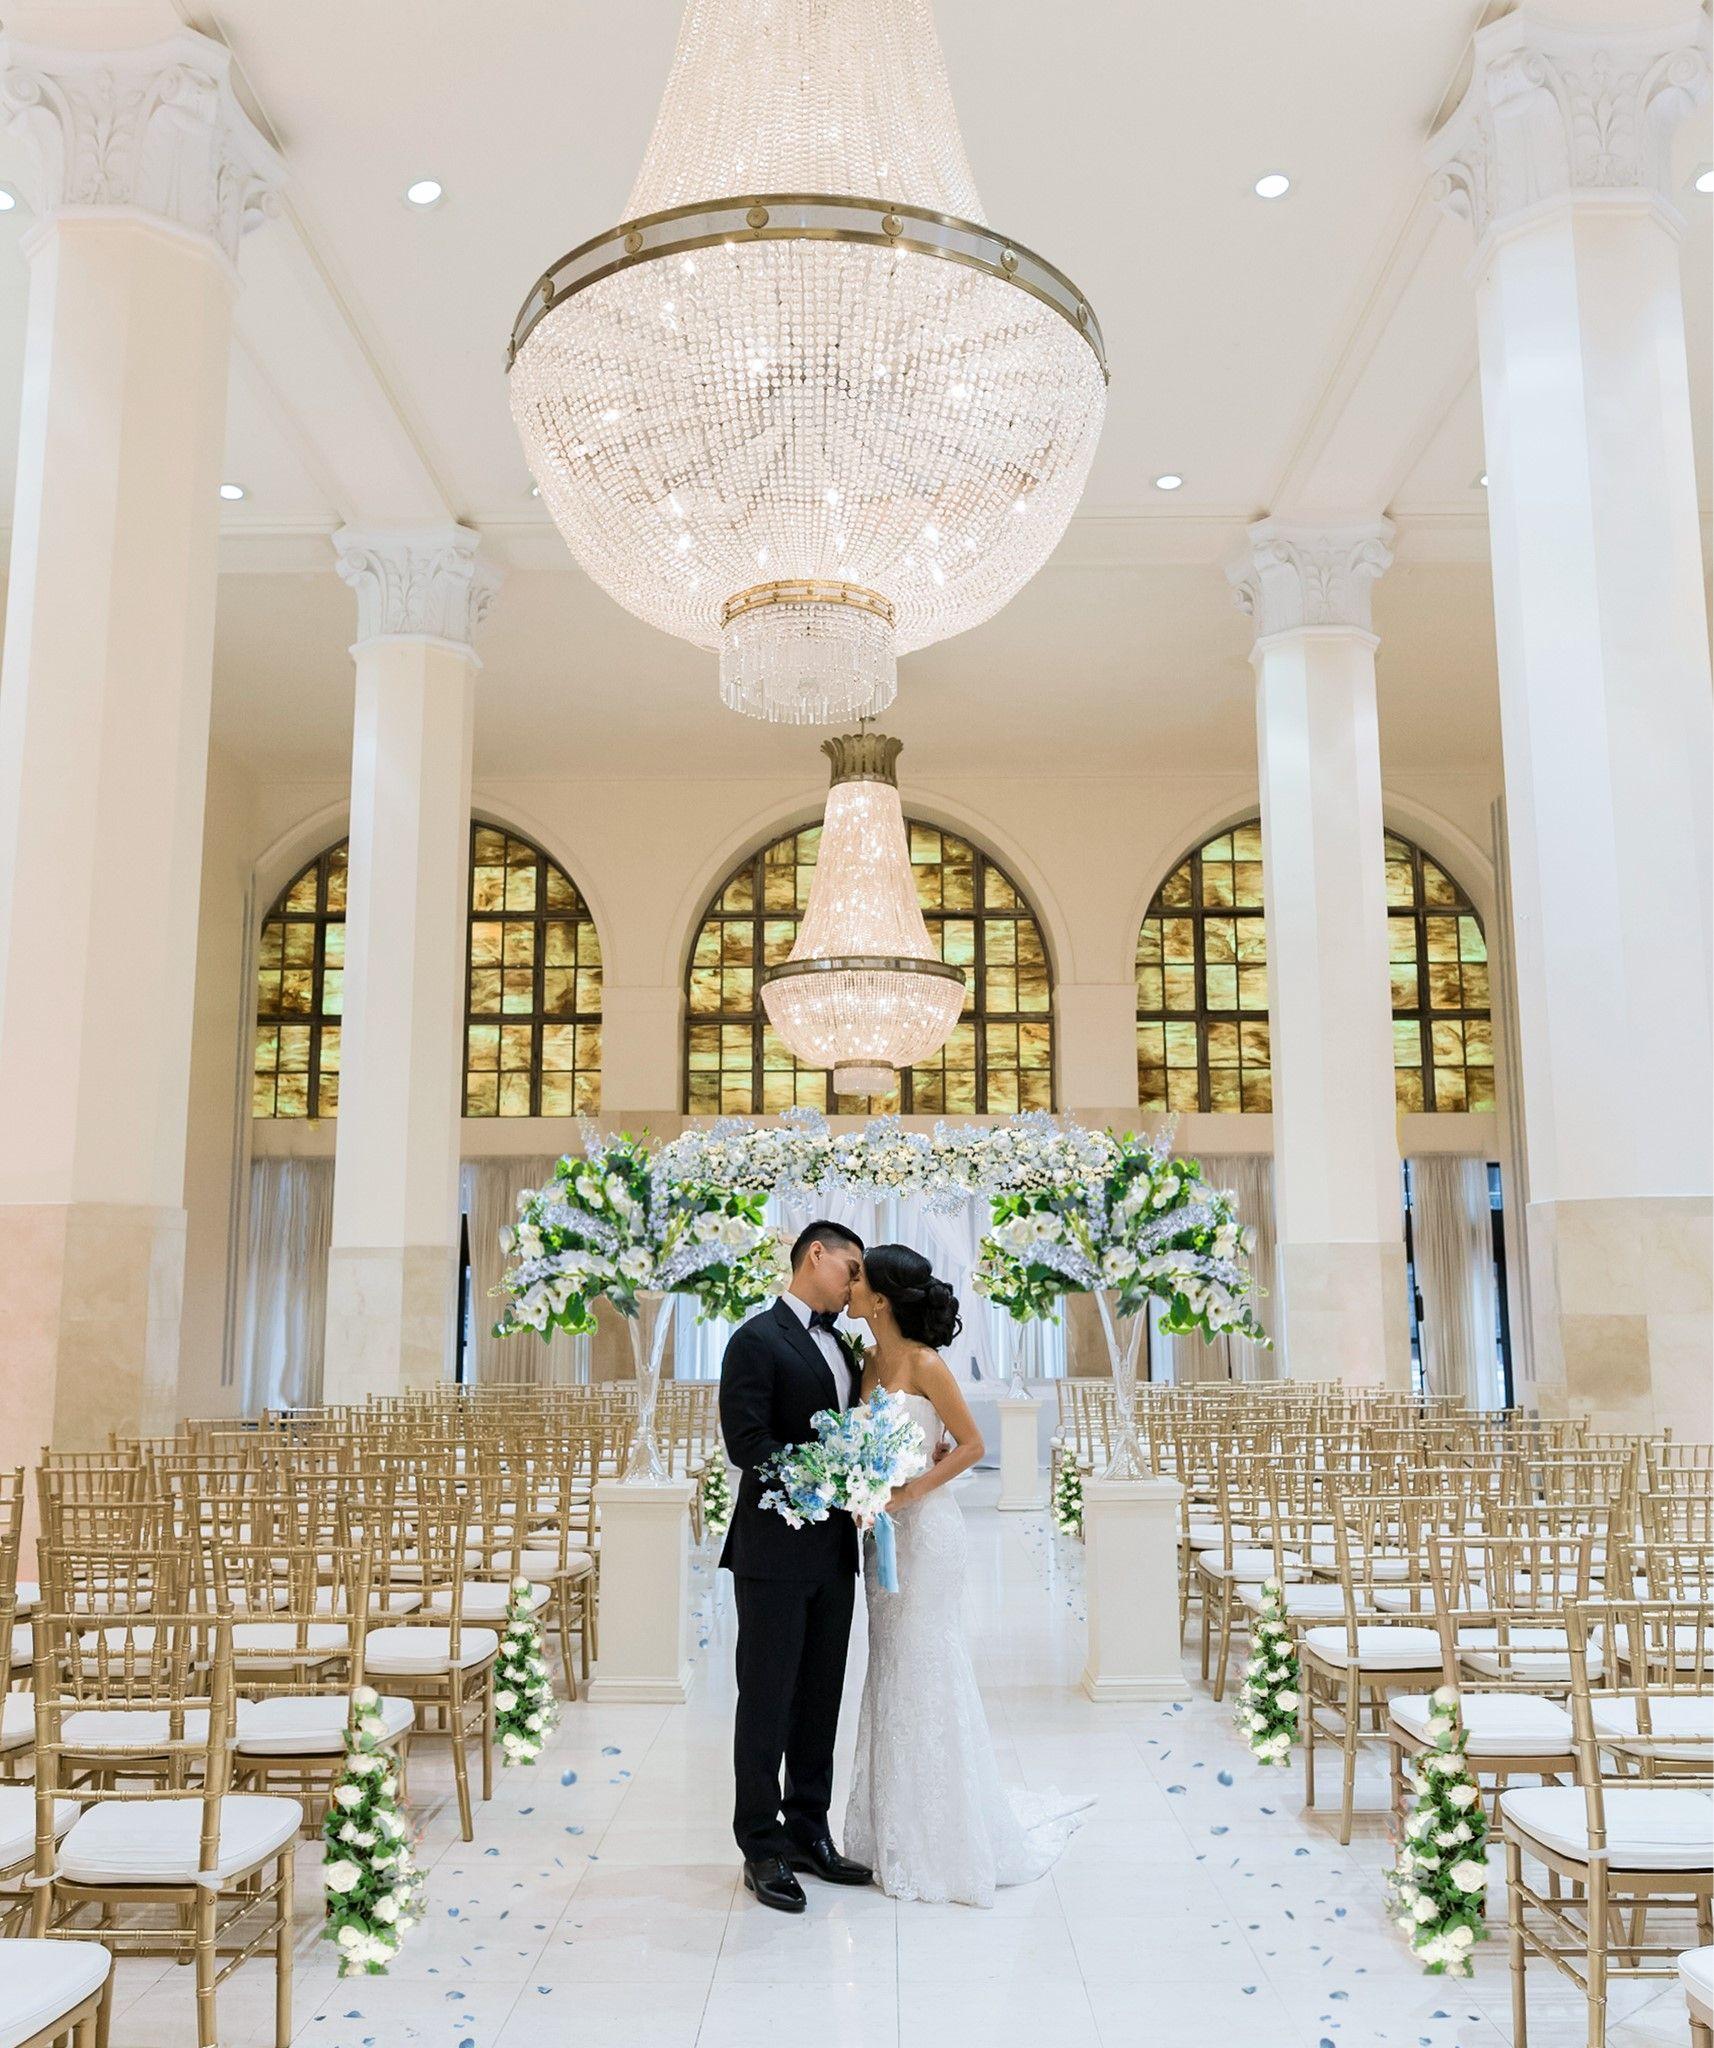 Gorgeous Weddings at Southern Exchange in Downtown Atlanta